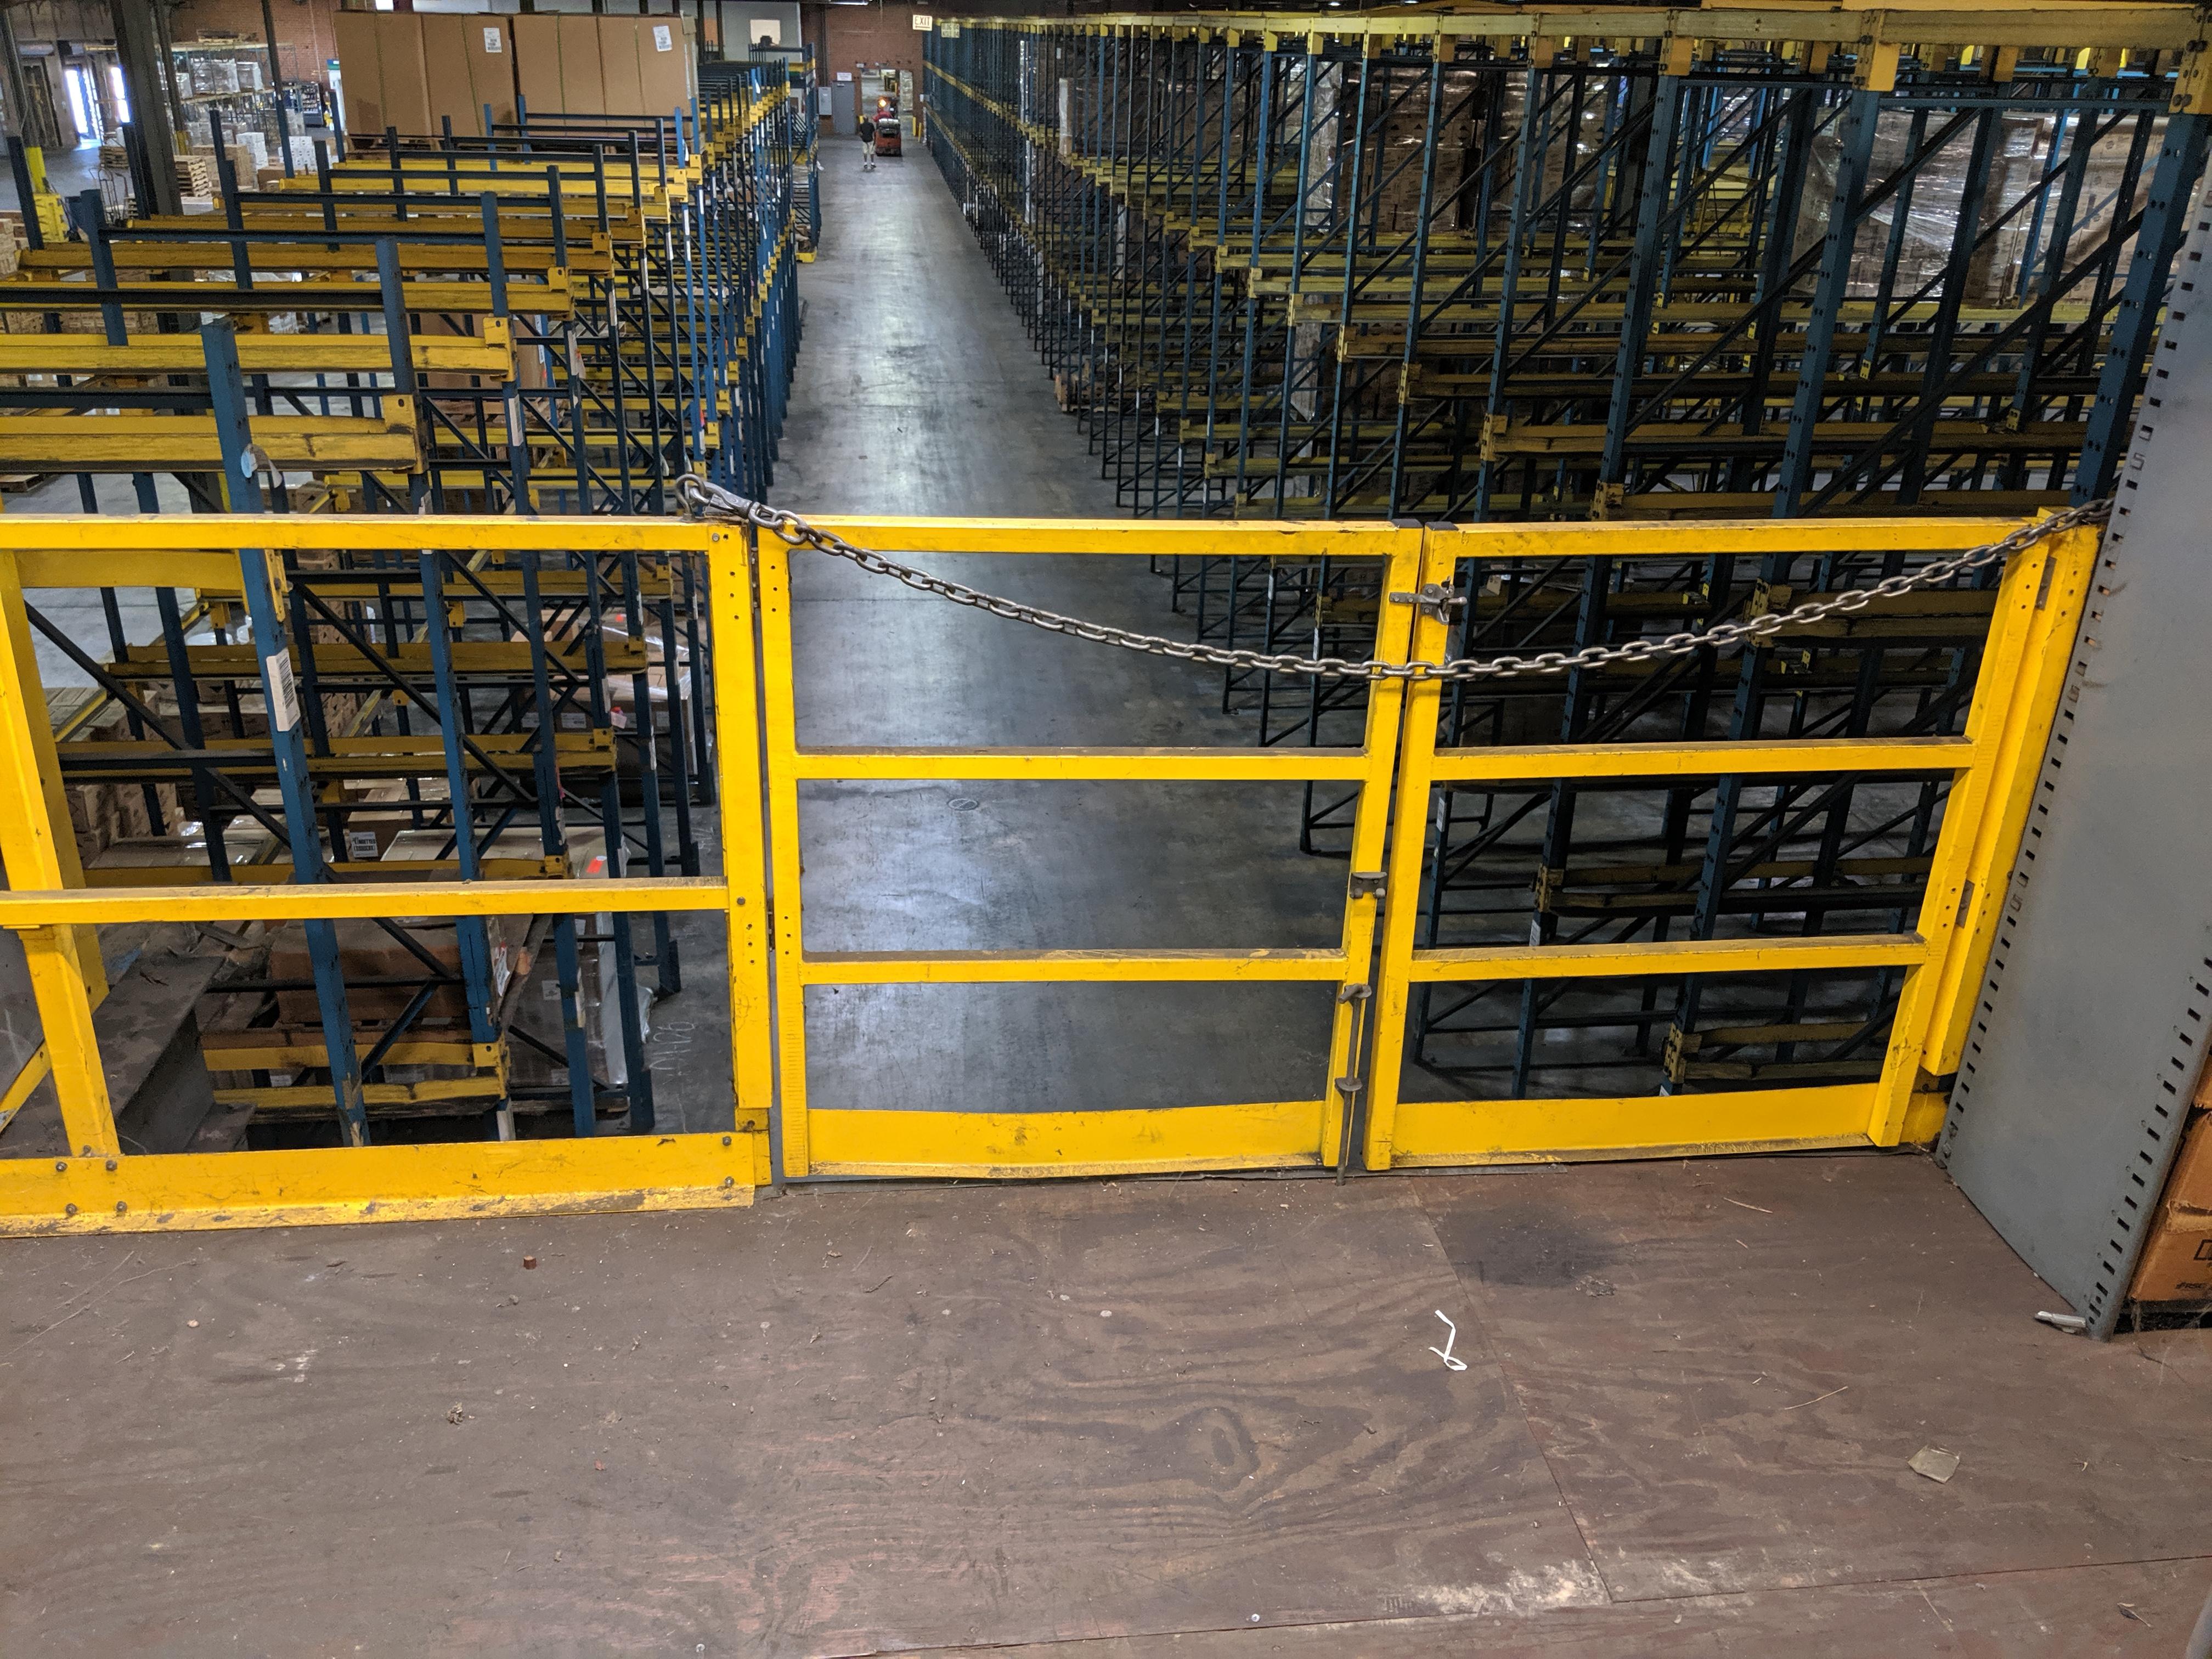 Parts shelving units - Image 8 of 9